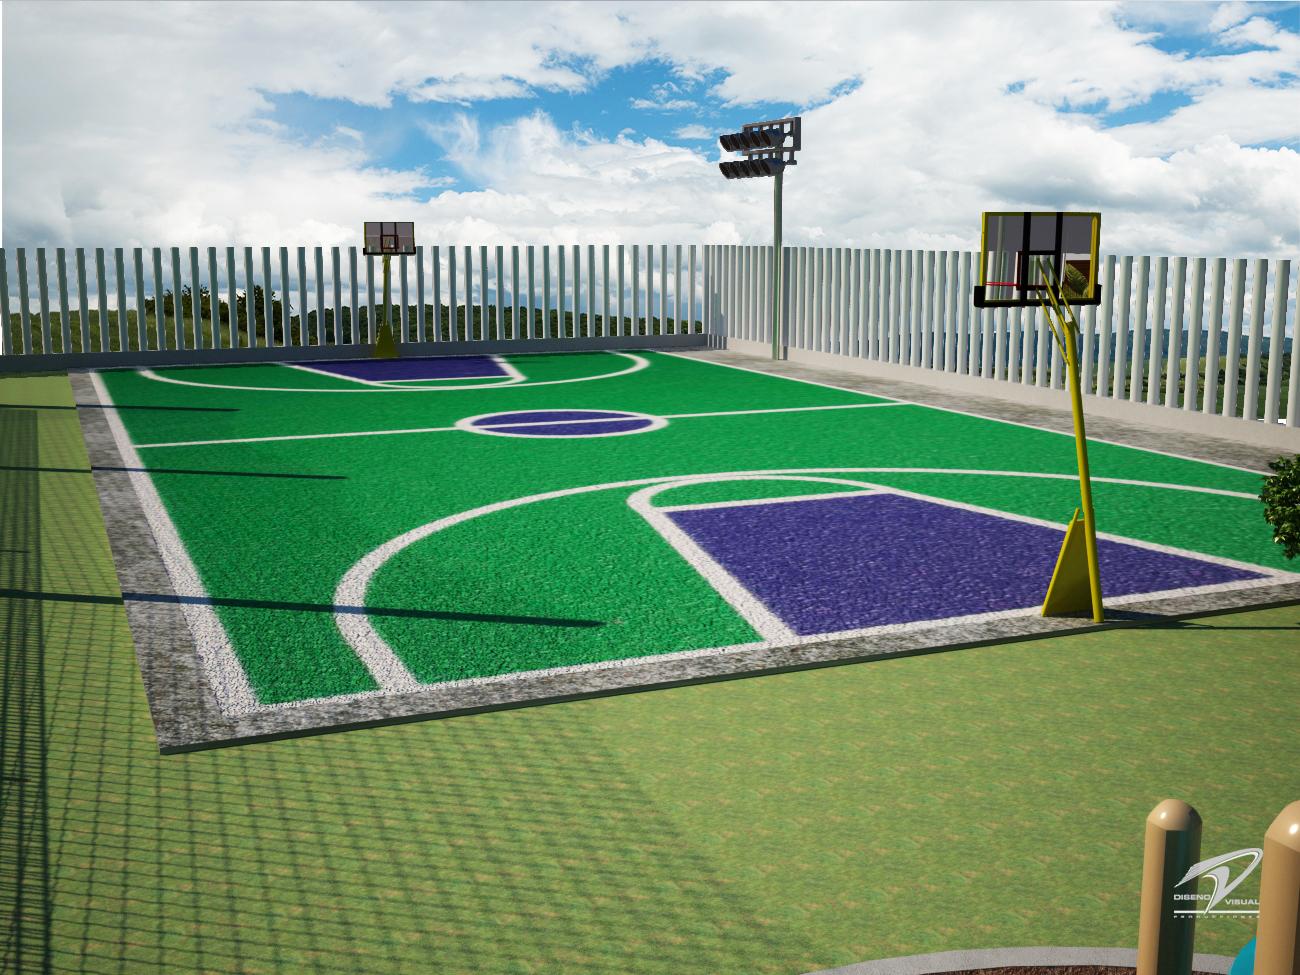 Centro deportivo